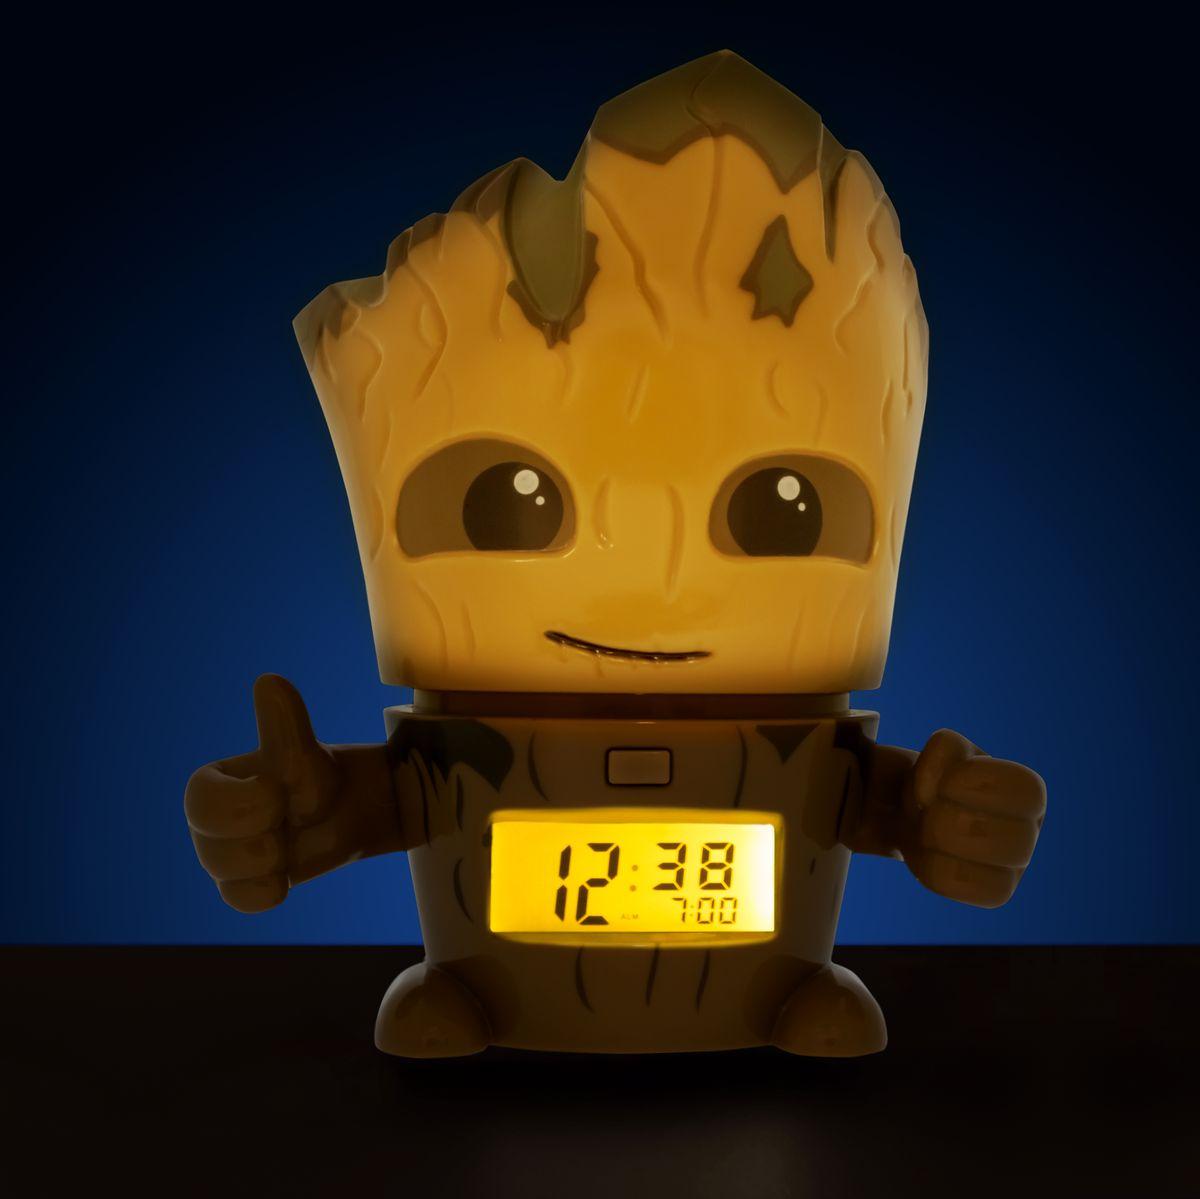 Marvel Guardians of the Galaxy Vol. 2 Будильник BulbBotz Groot